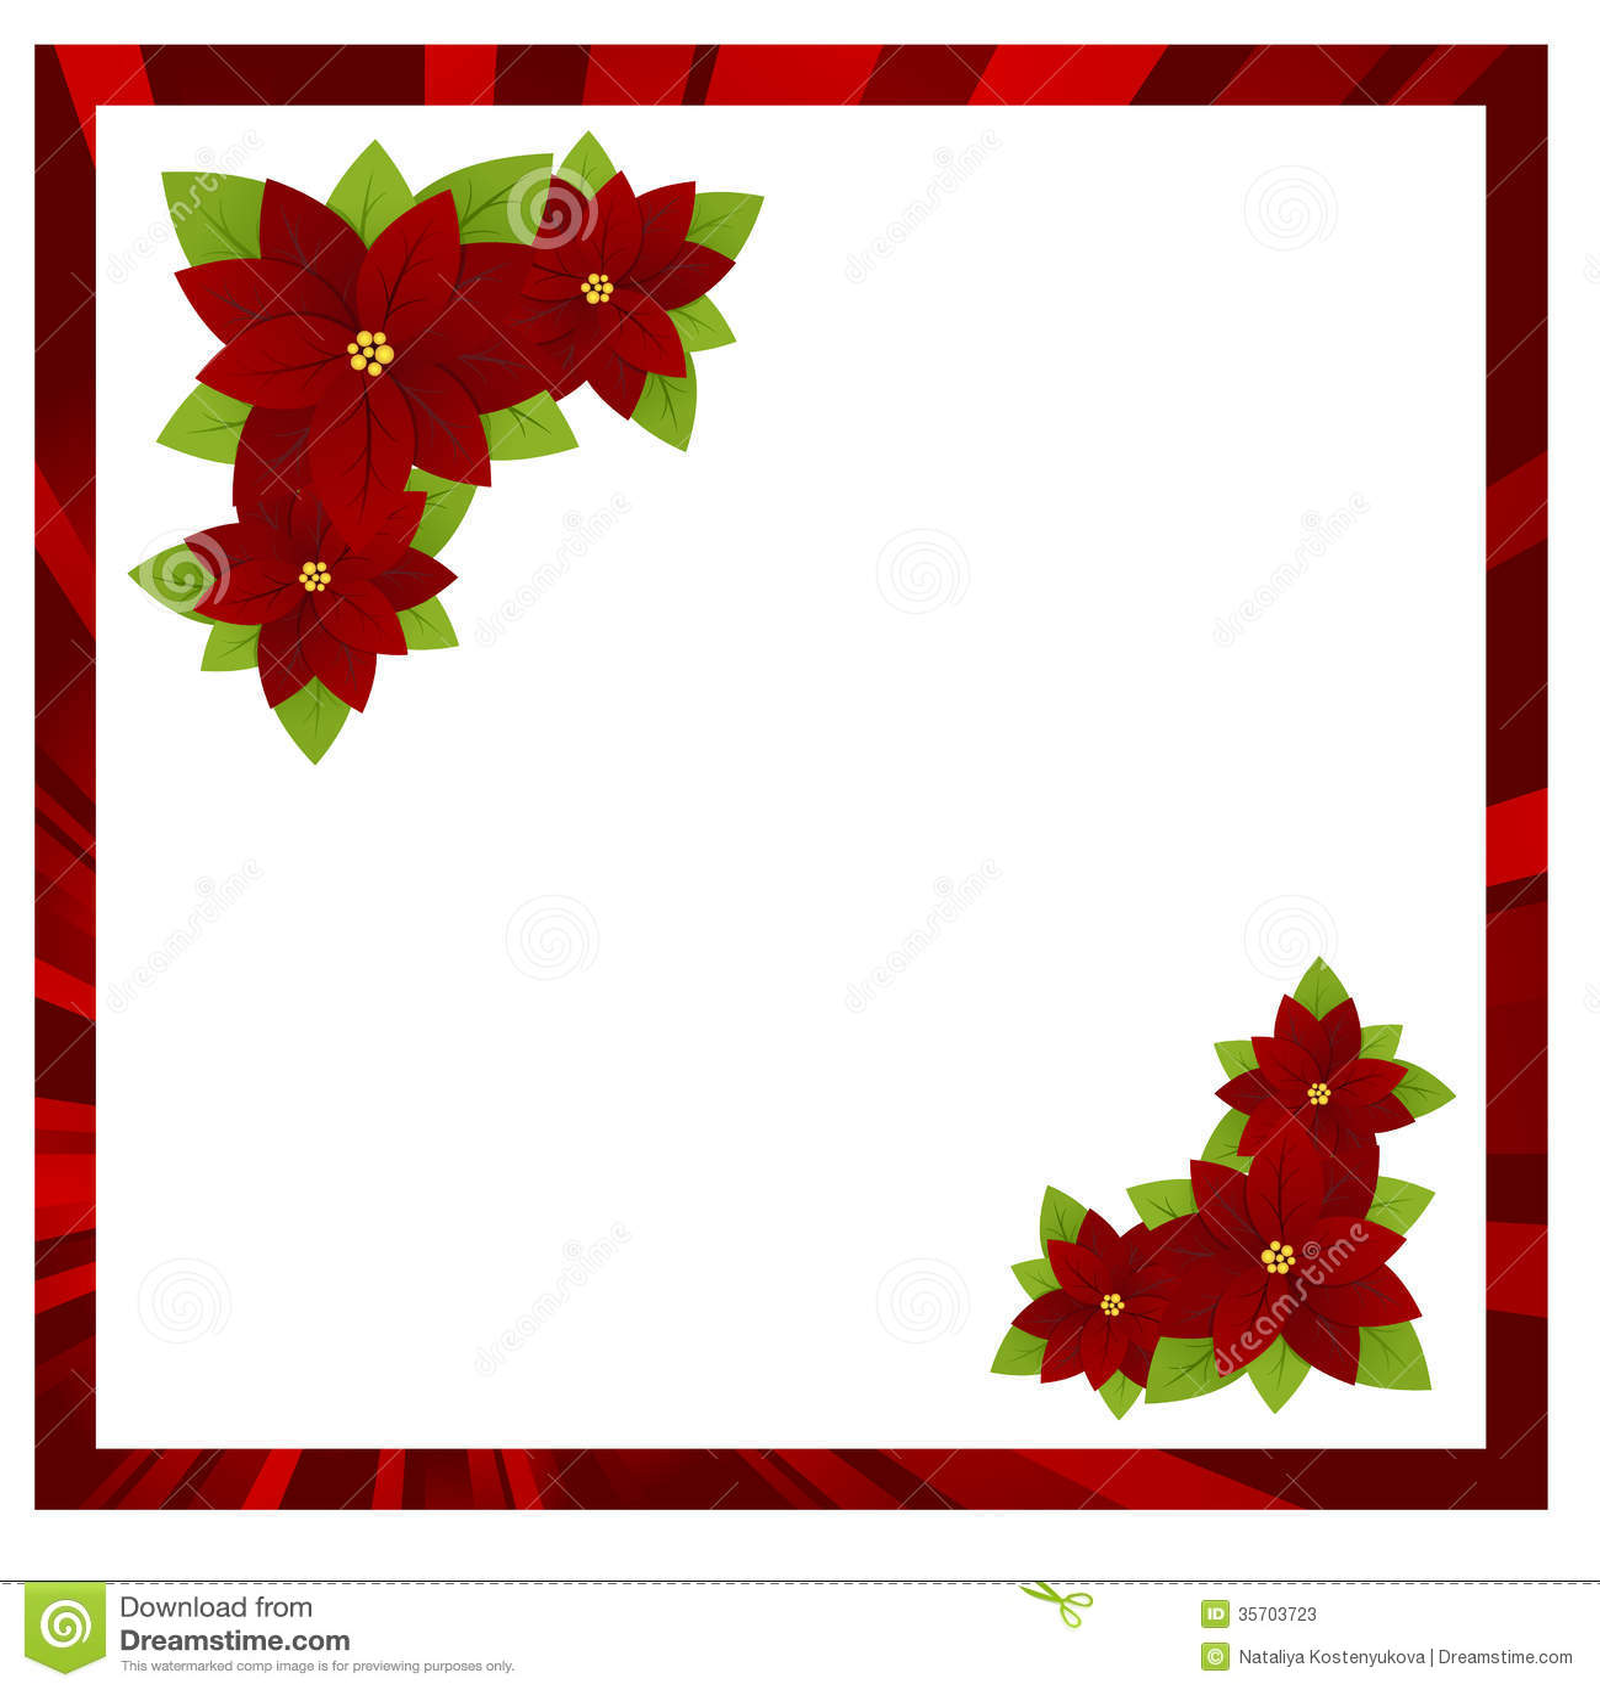 Christmas frame stock photos image 35703723 for Poinsettia christmas tree frame